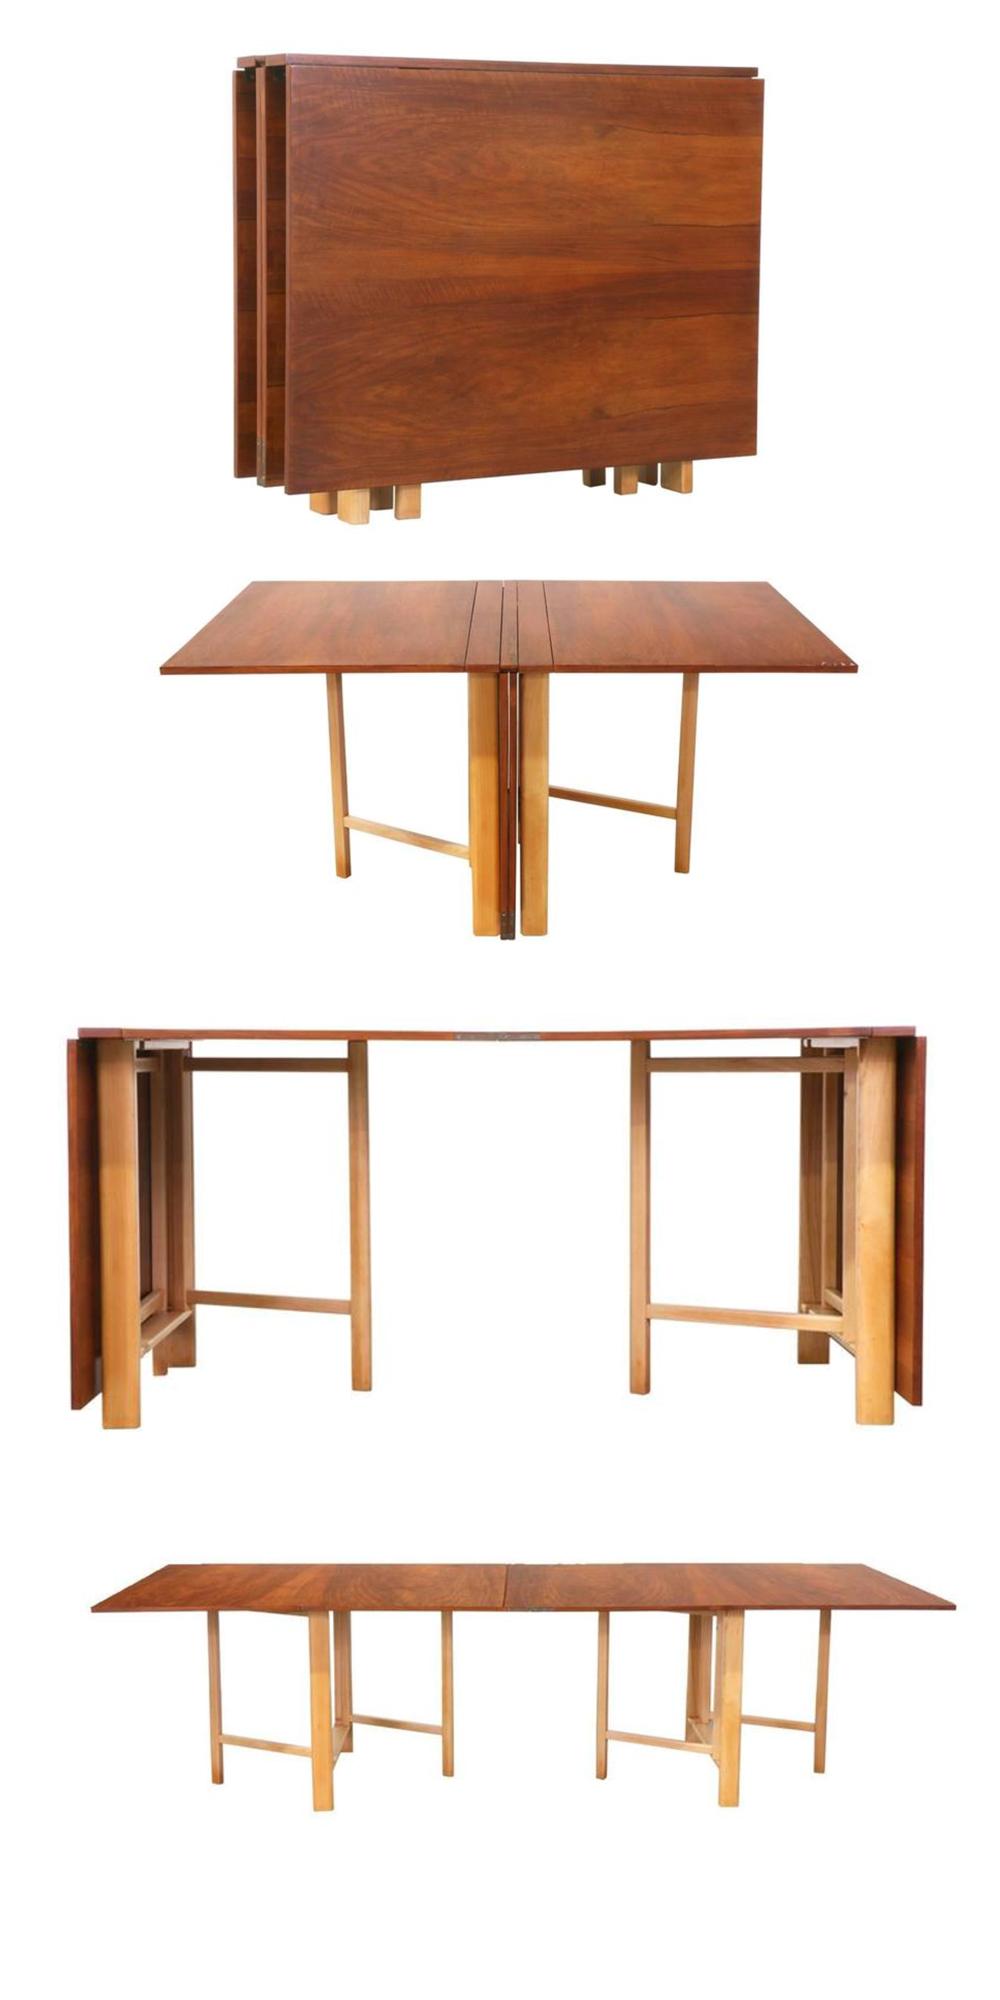 Tavoli da cucina per piccoli spazi beautiful best for Tavoli da pranzo per piccoli spazi